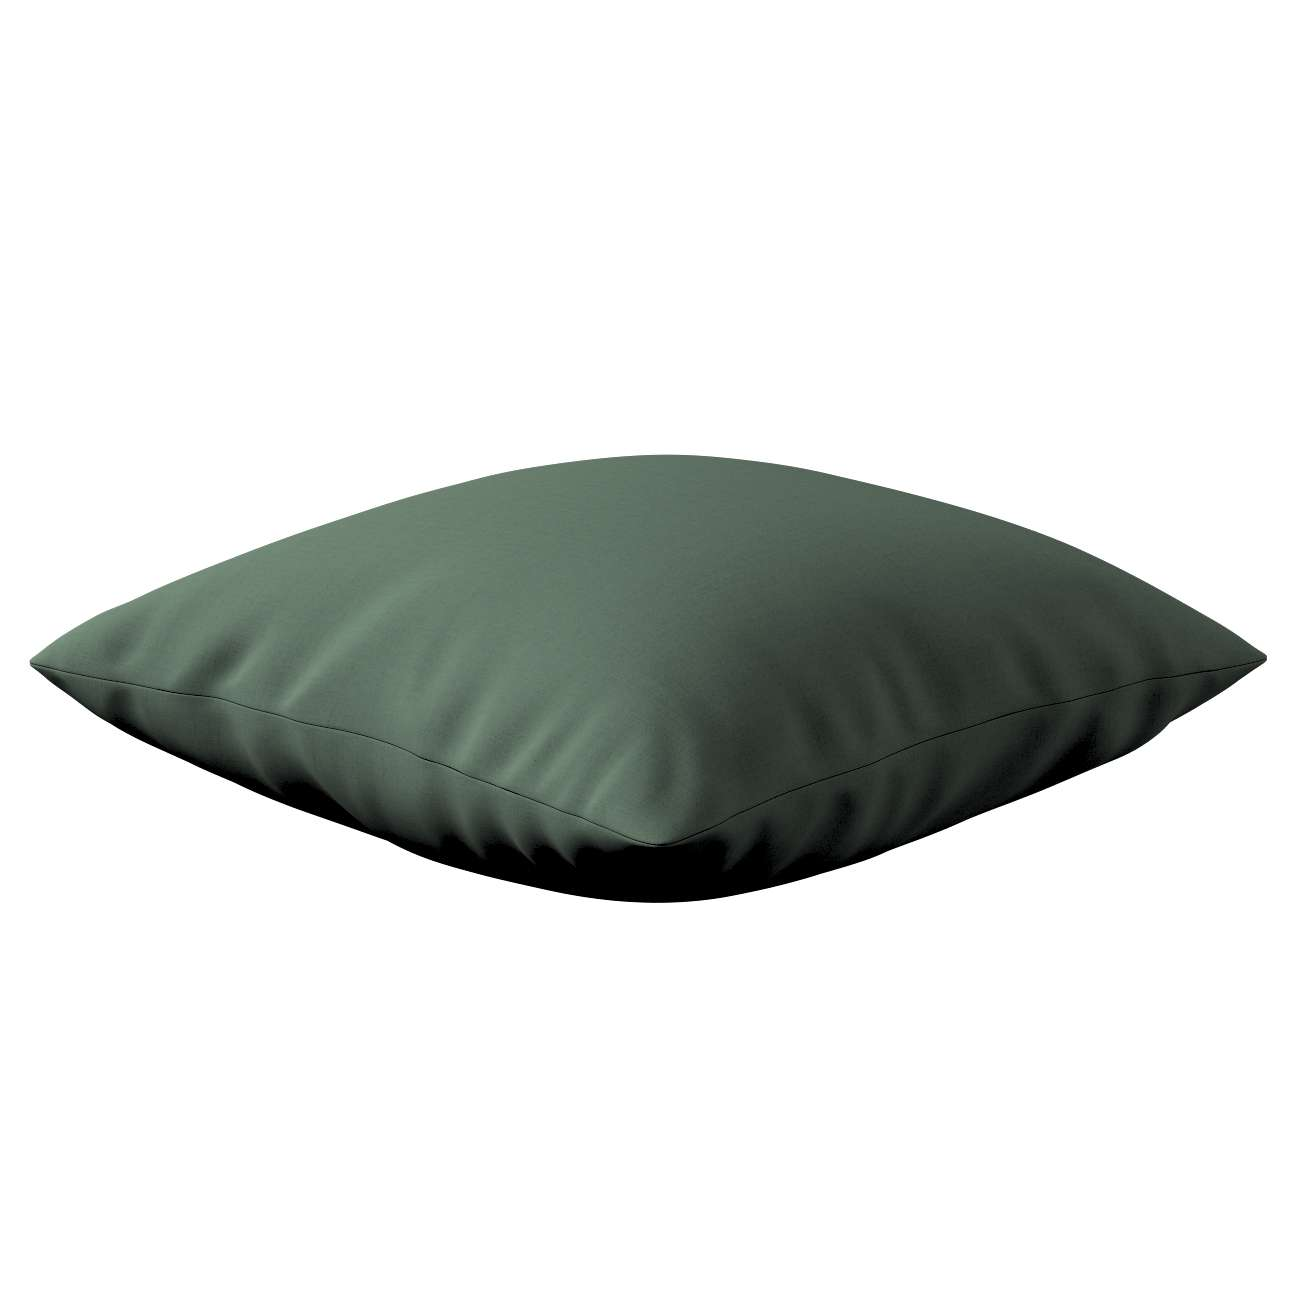 Kinga - potah na polštář jednoduchý v kolekci Linen, látka: 159-08